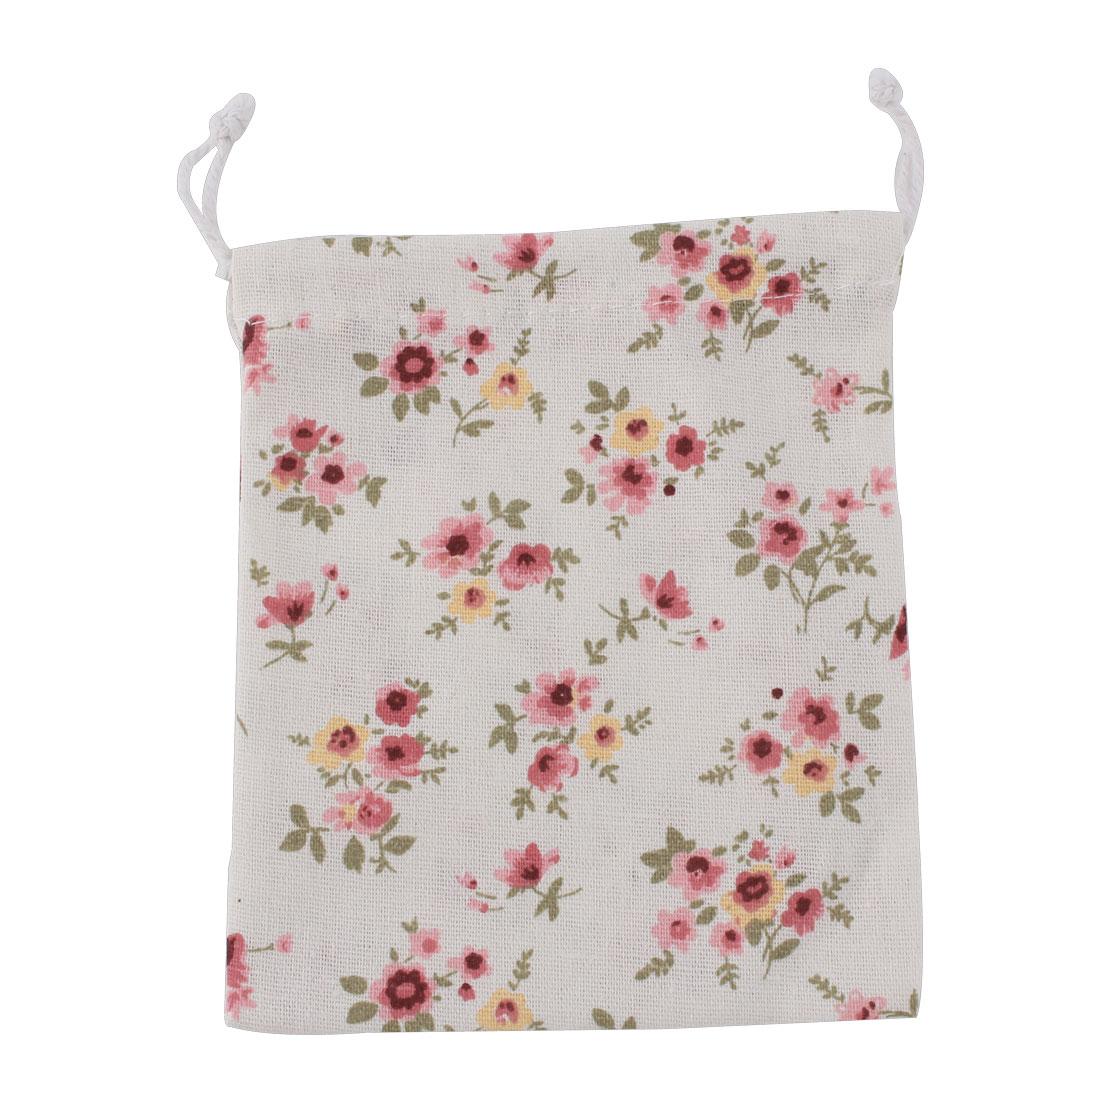 Home Travel Cotton Linen Flower Pattern Storage Packing Bag Drawstring Pouch Holder